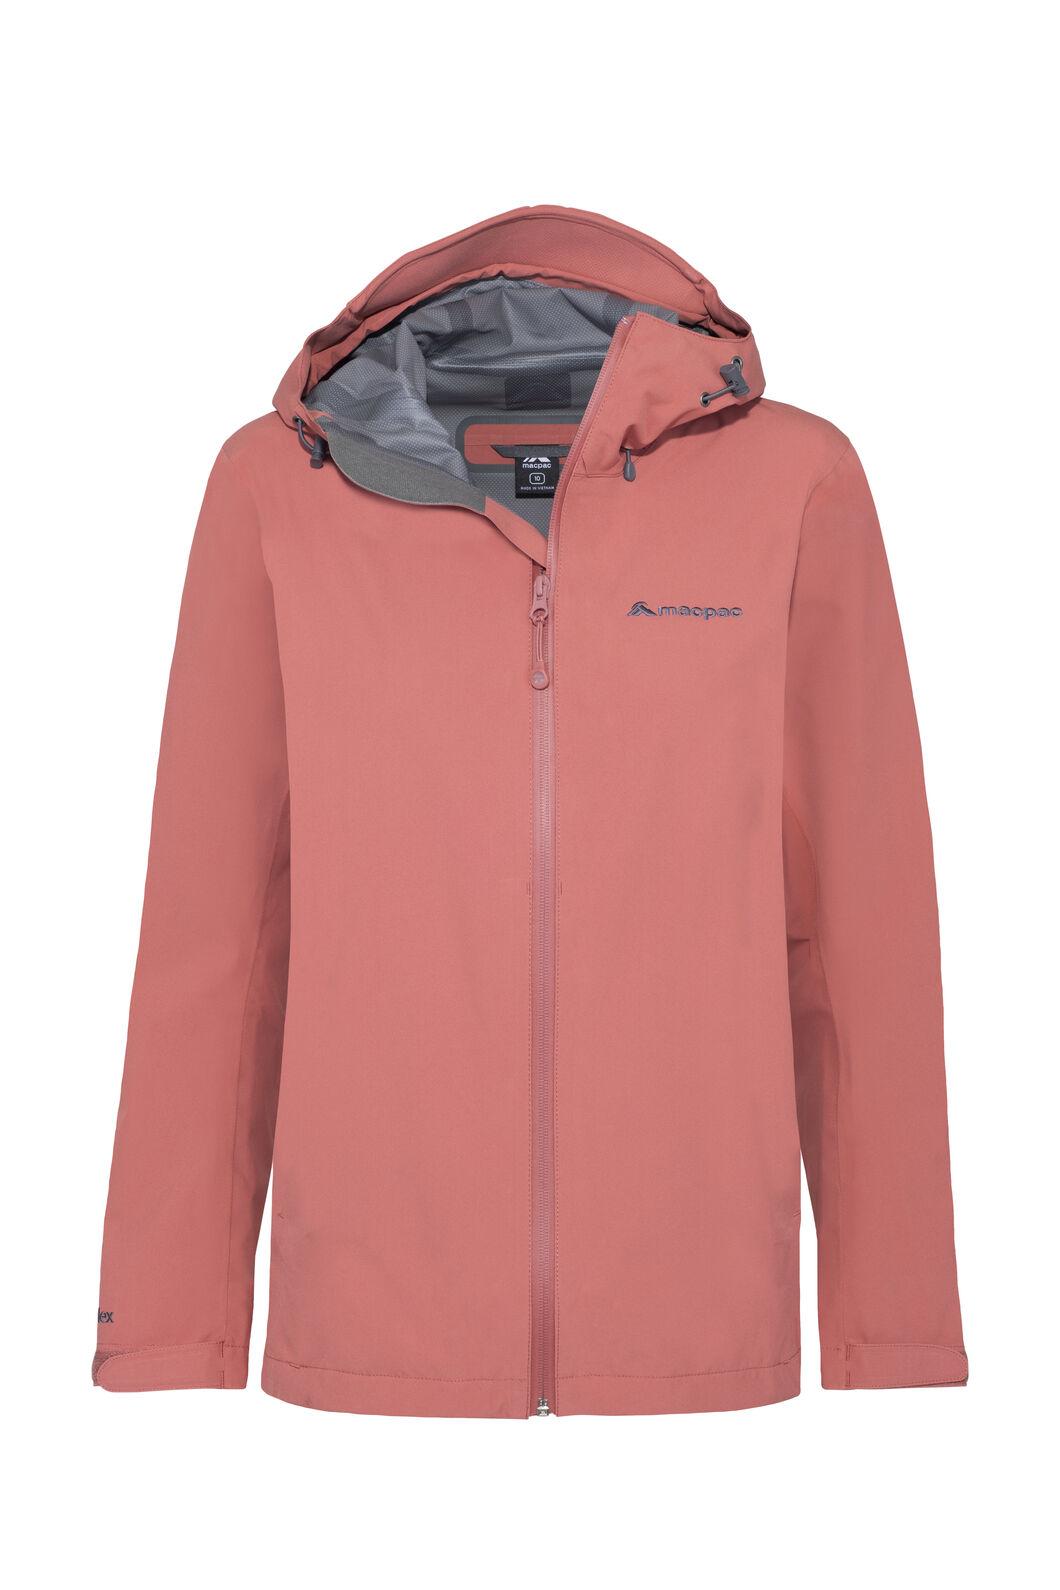 Macpac Dispatch Rain Jacket — Women's, Dusty Cedar, hi-res